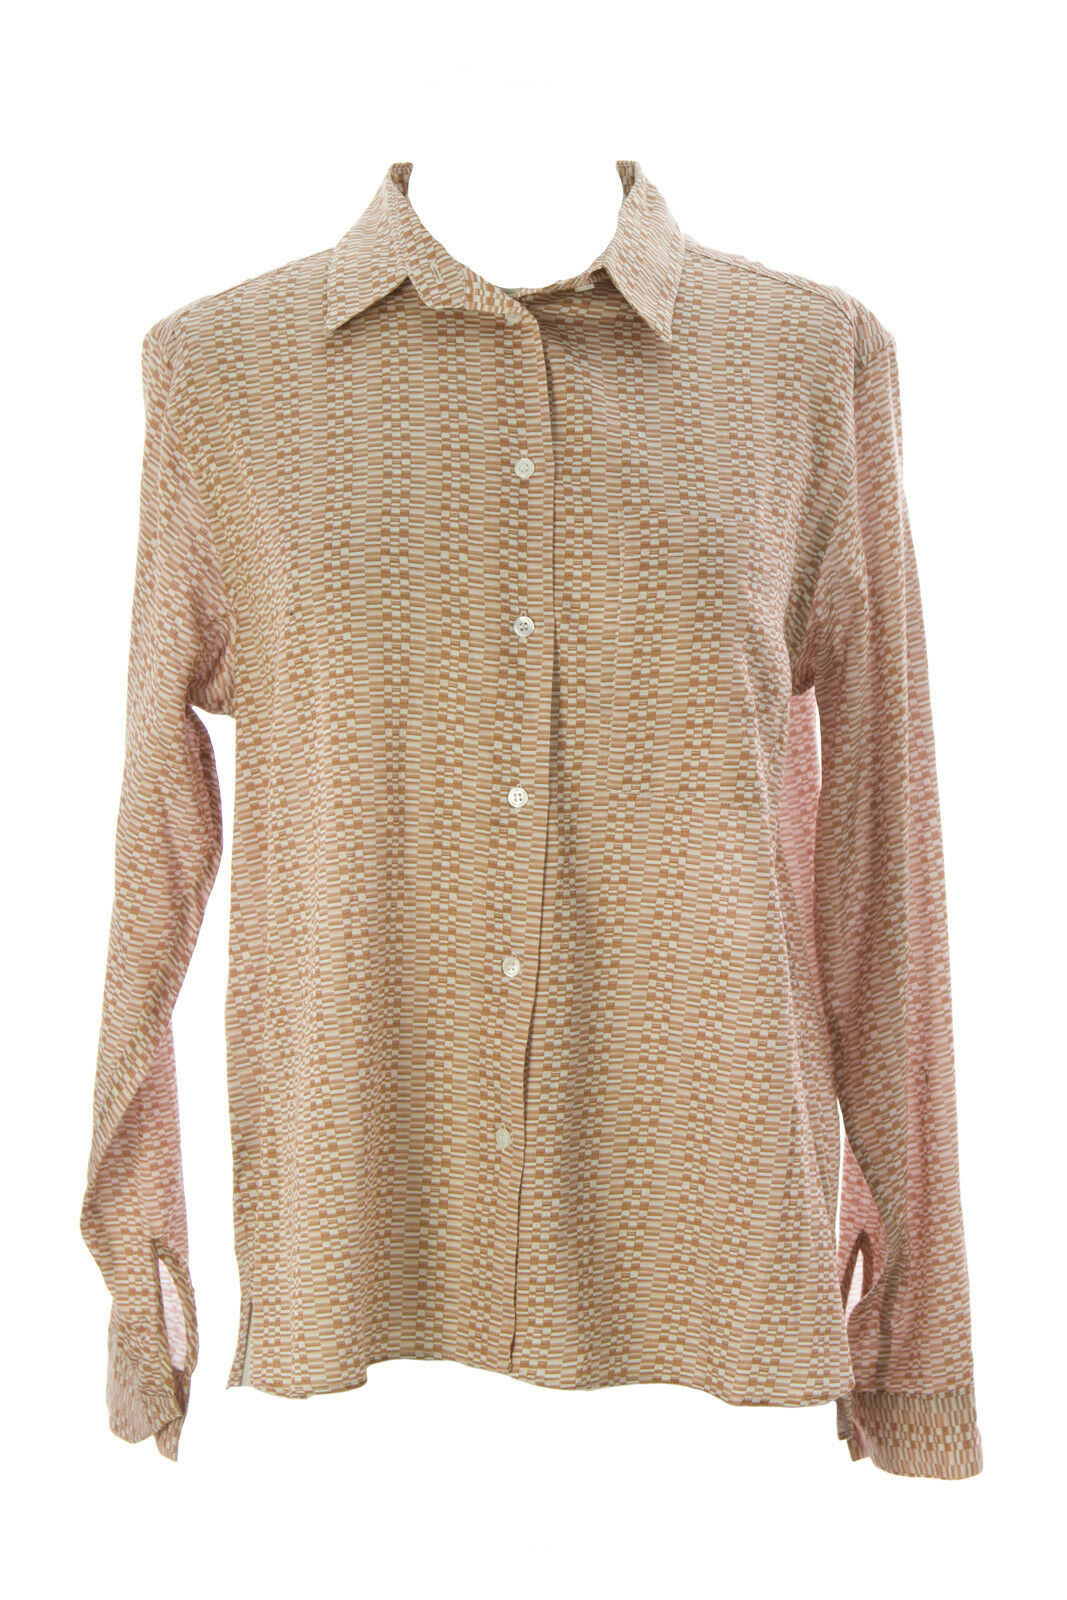 Oberfläche zu Luft Damen Gebrannte Sienna Bedruckt Zulu Shirt Neu